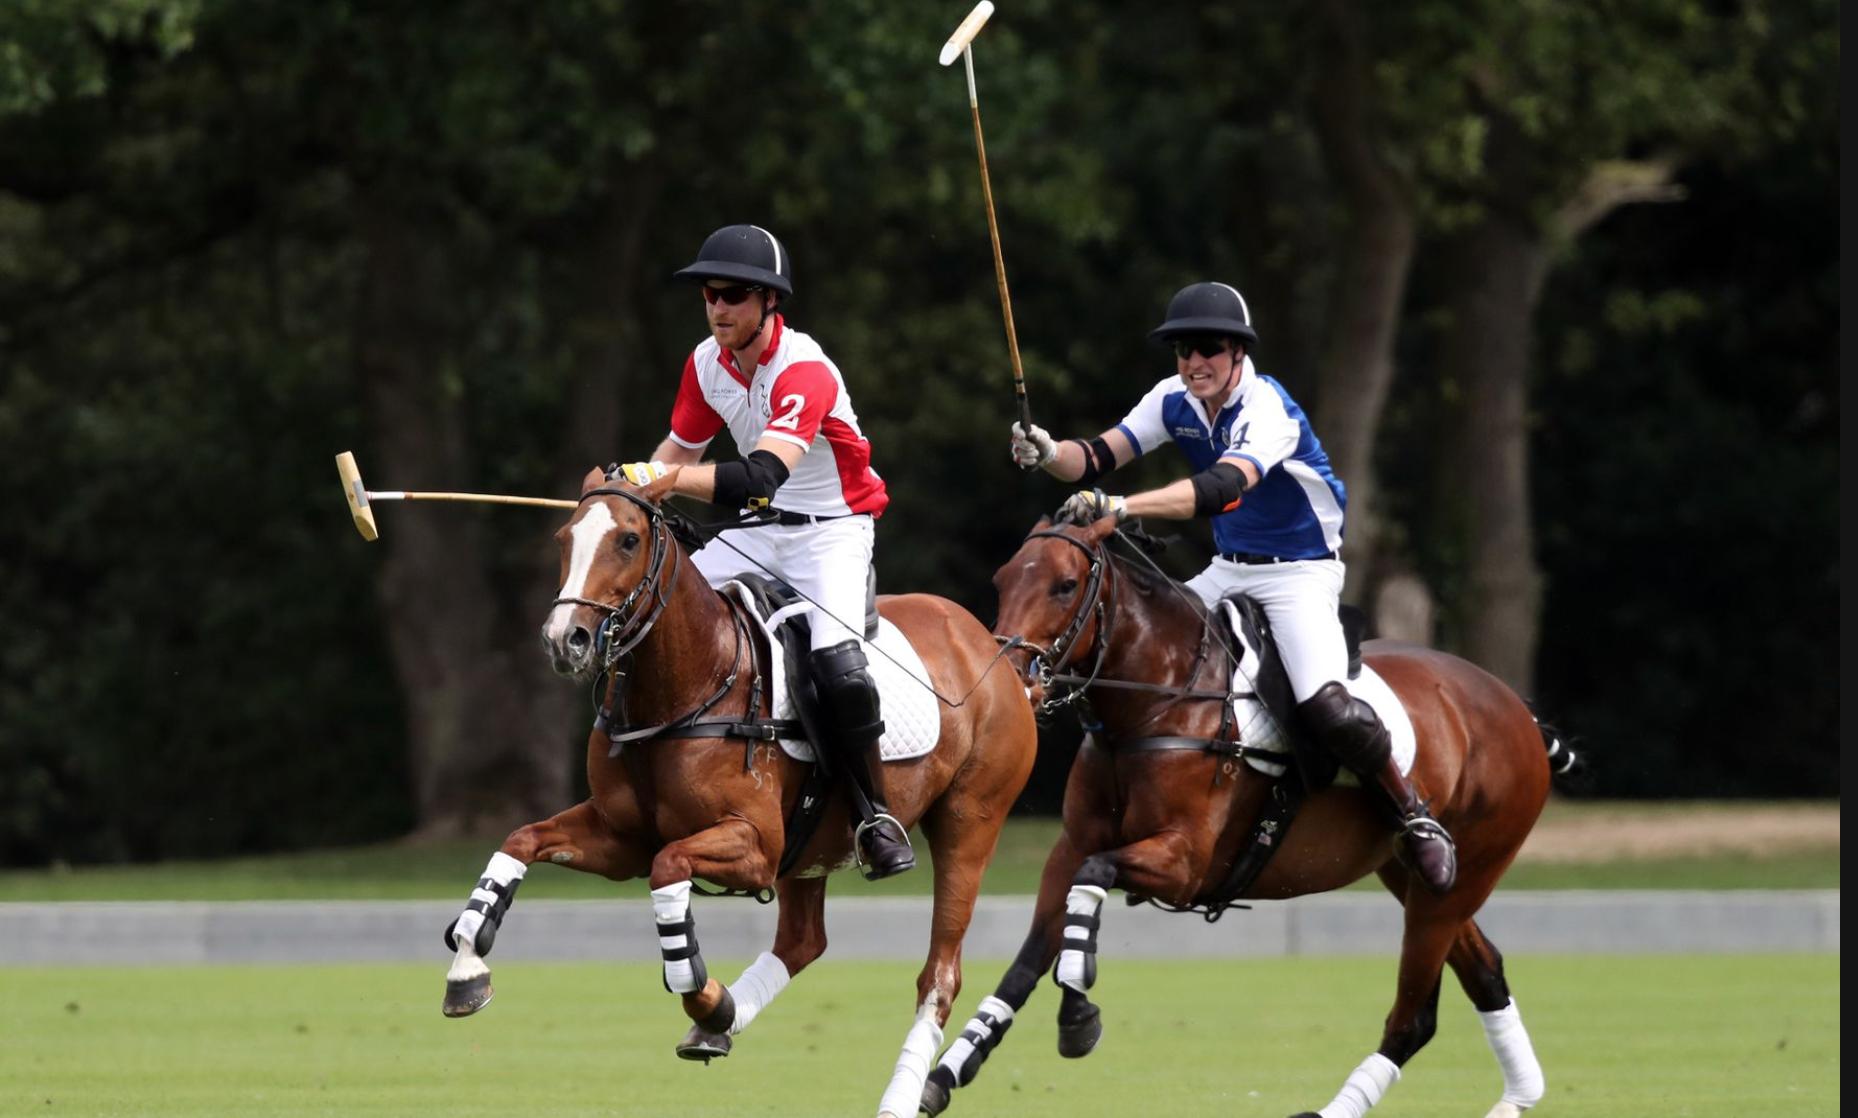 prince harry prince william playing polo